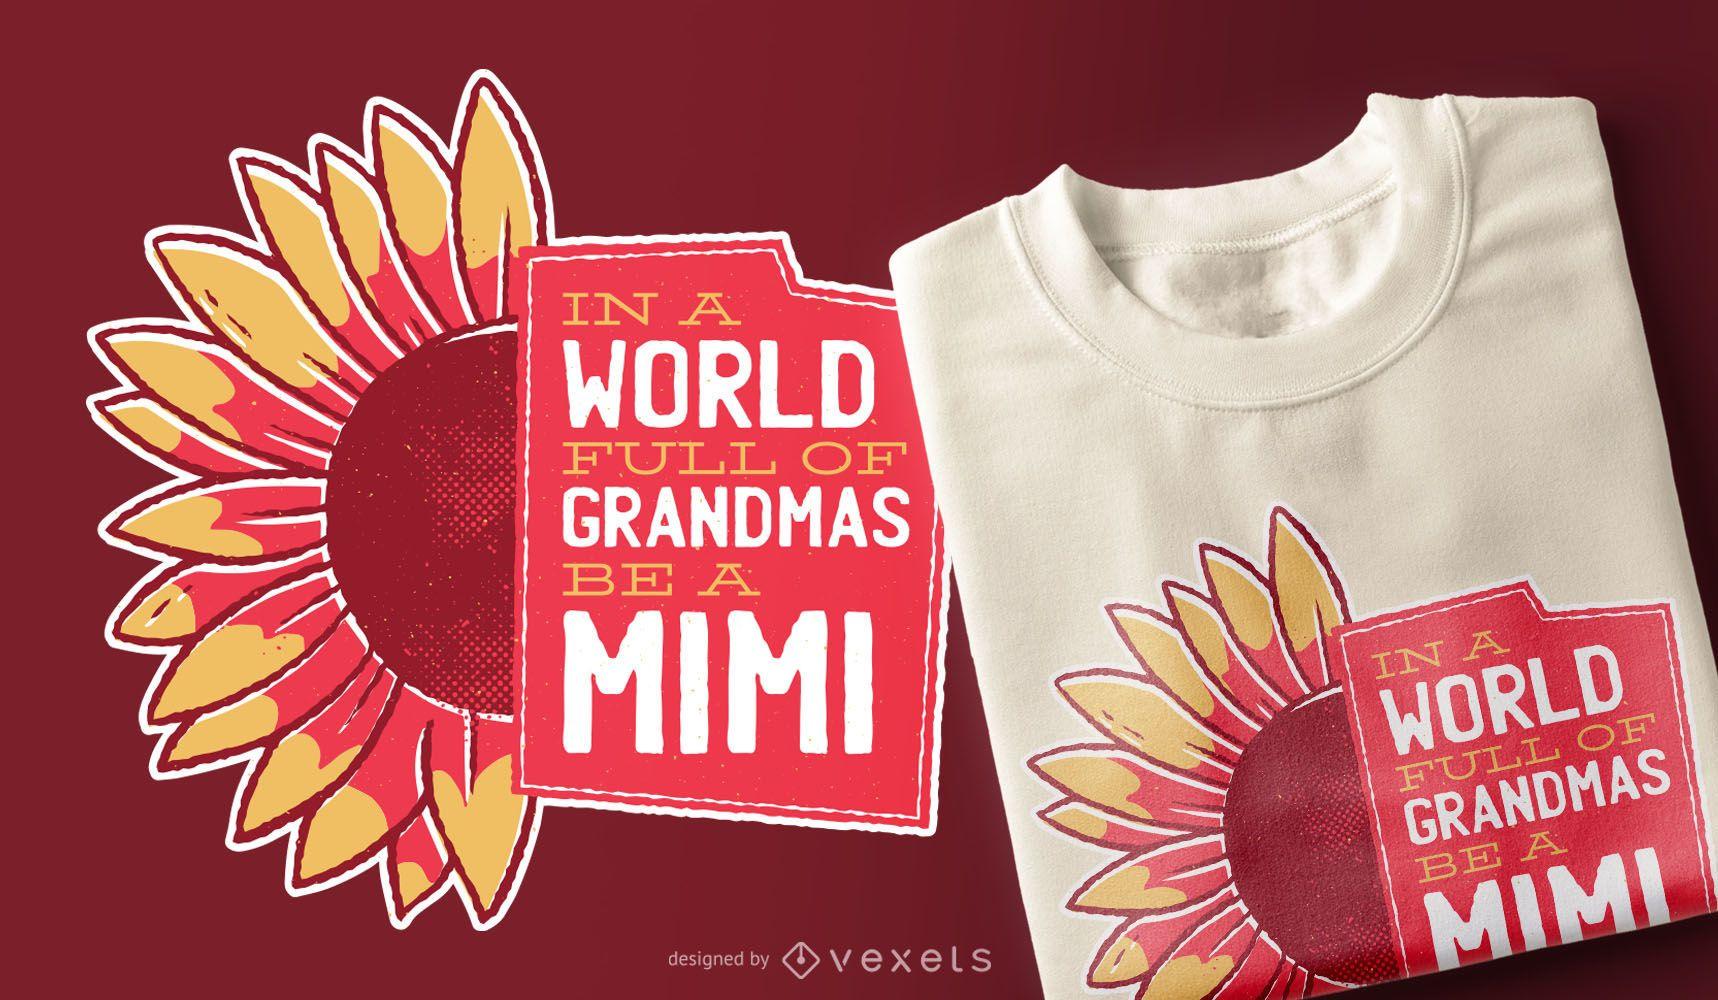 Grandma cute quote t-shirt design